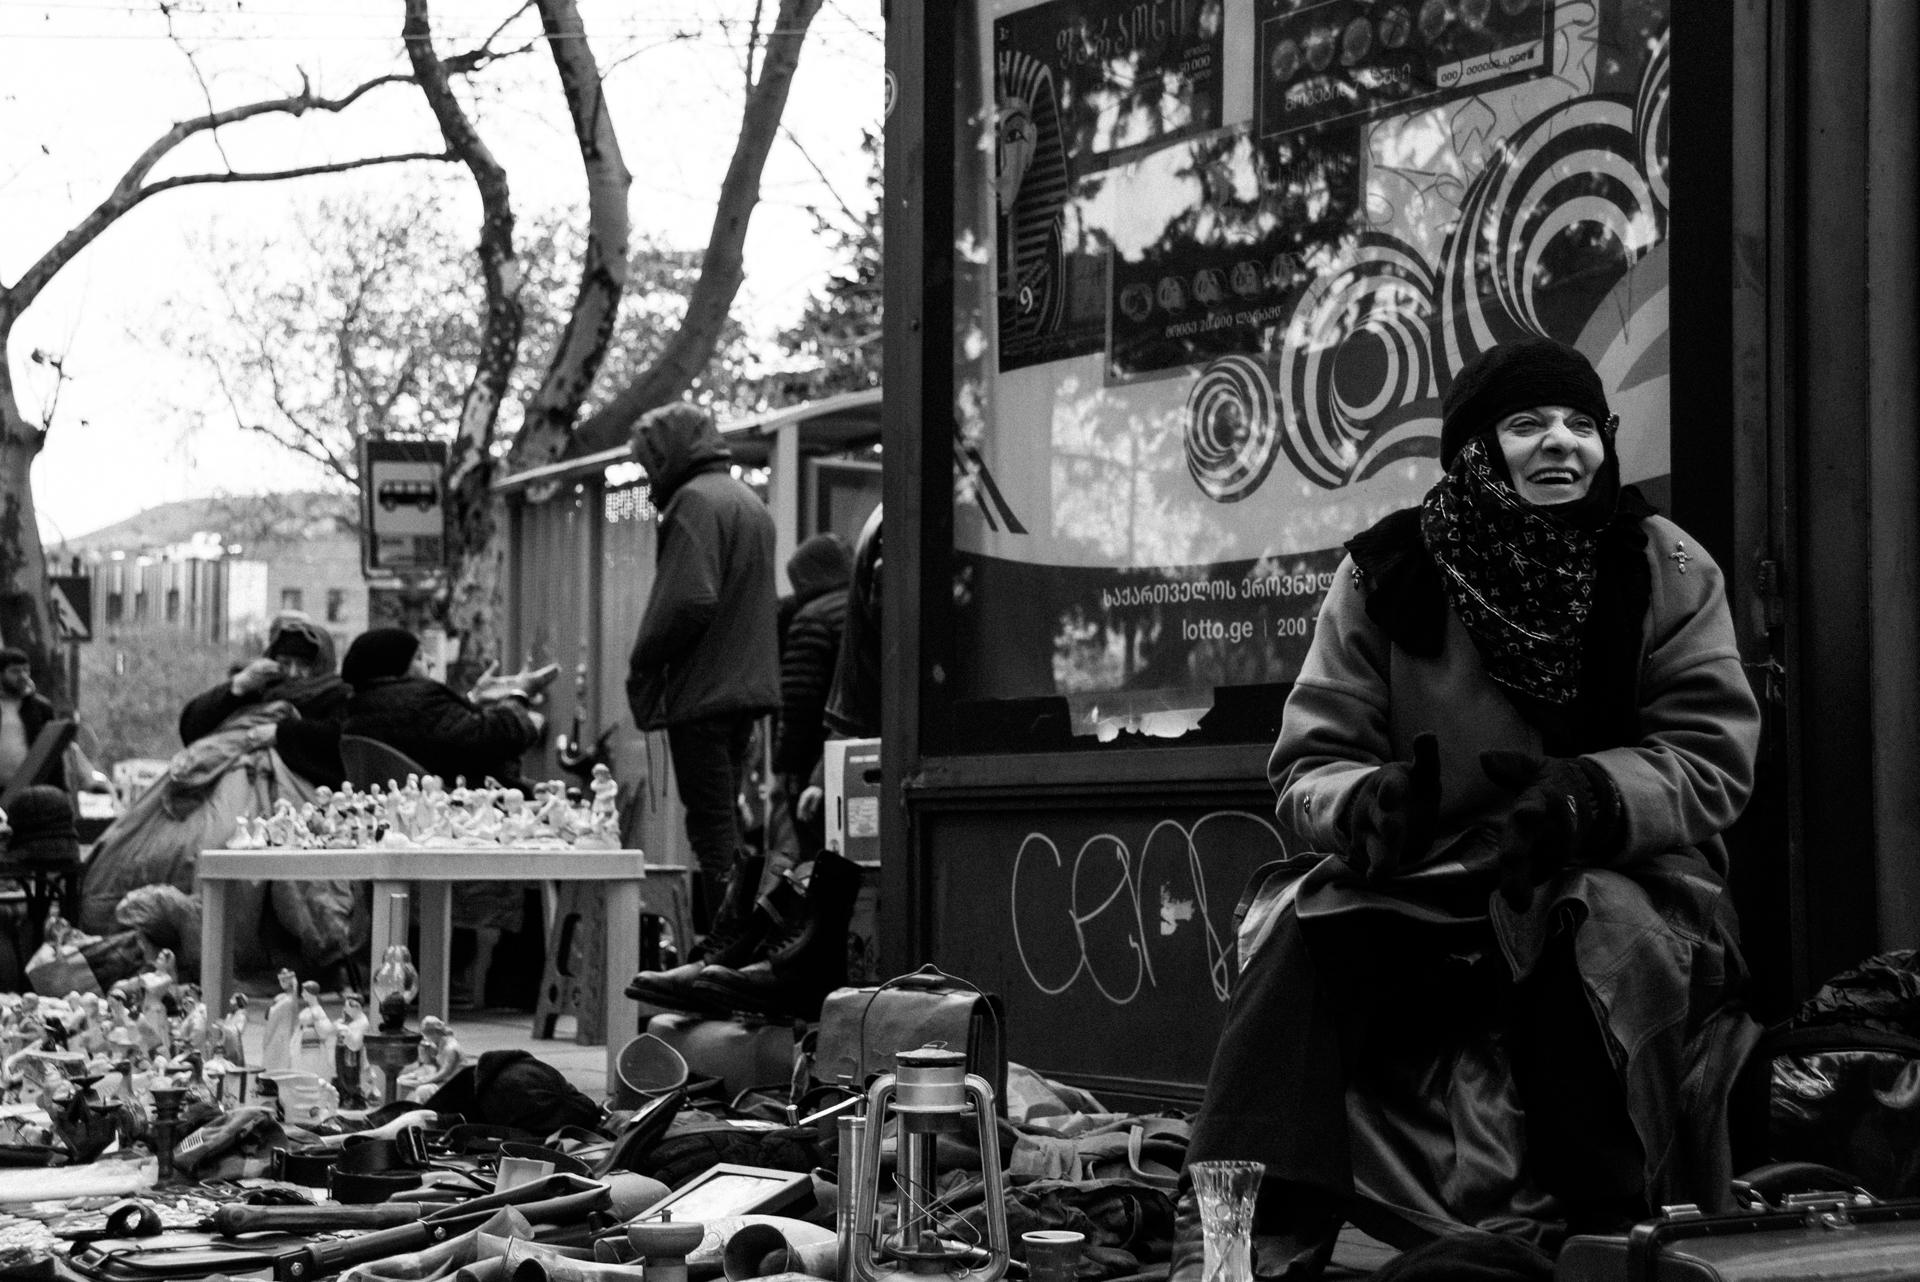 tbilisi-georgia-black-and-white-photography (16).jpg